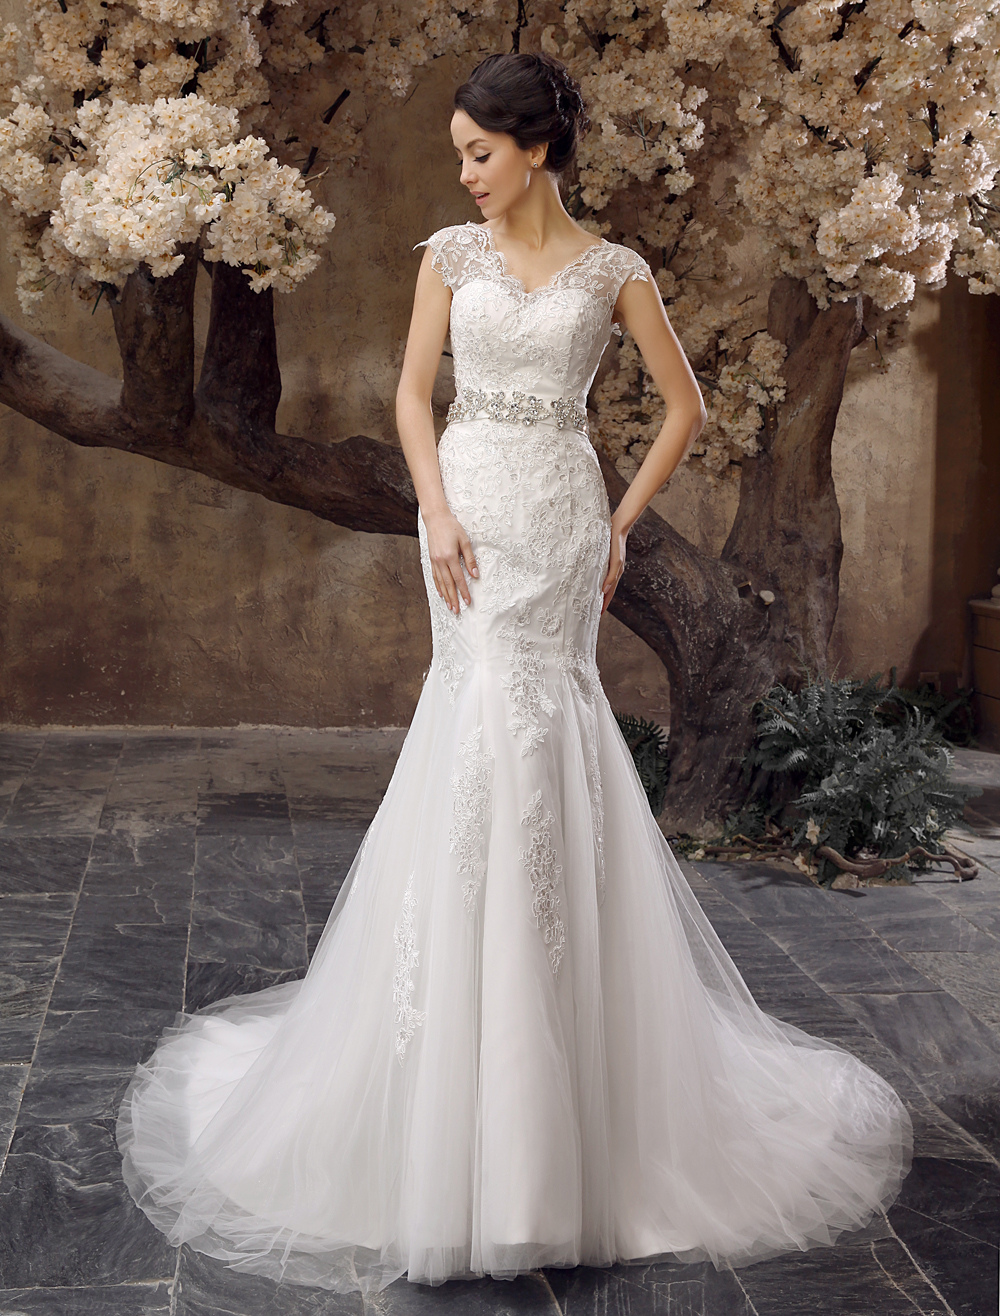 Ivory Mermaid V-Neck Rhinestone Court Train Tulle Wedding Dress For Bride